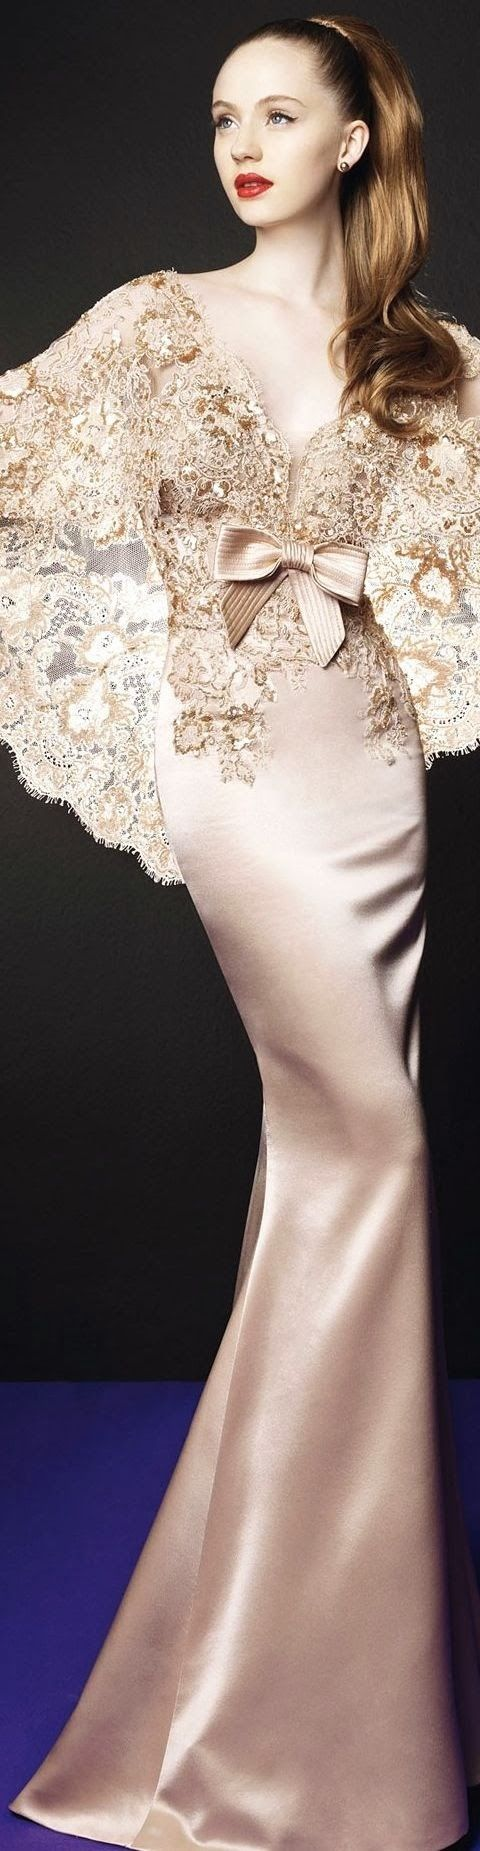 Zuhair Murad-Design~Gorgeous Lace Bodice. TG